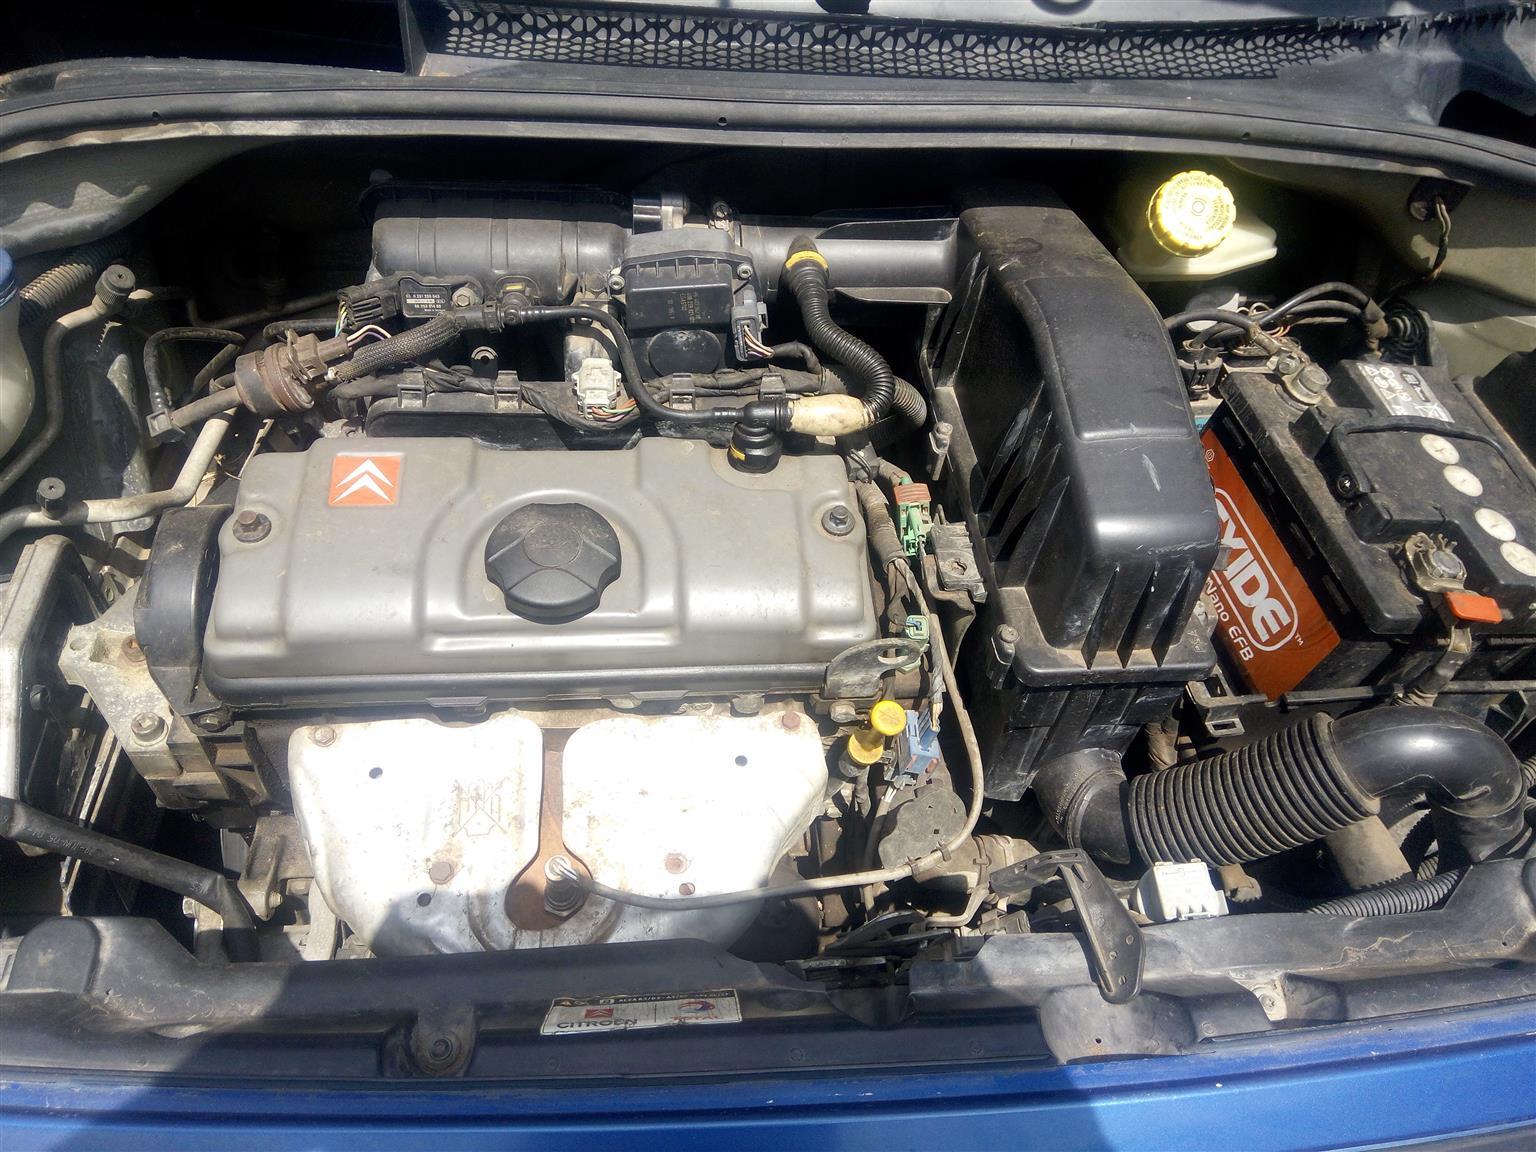 2004 Citroen C2 1.4 VTR